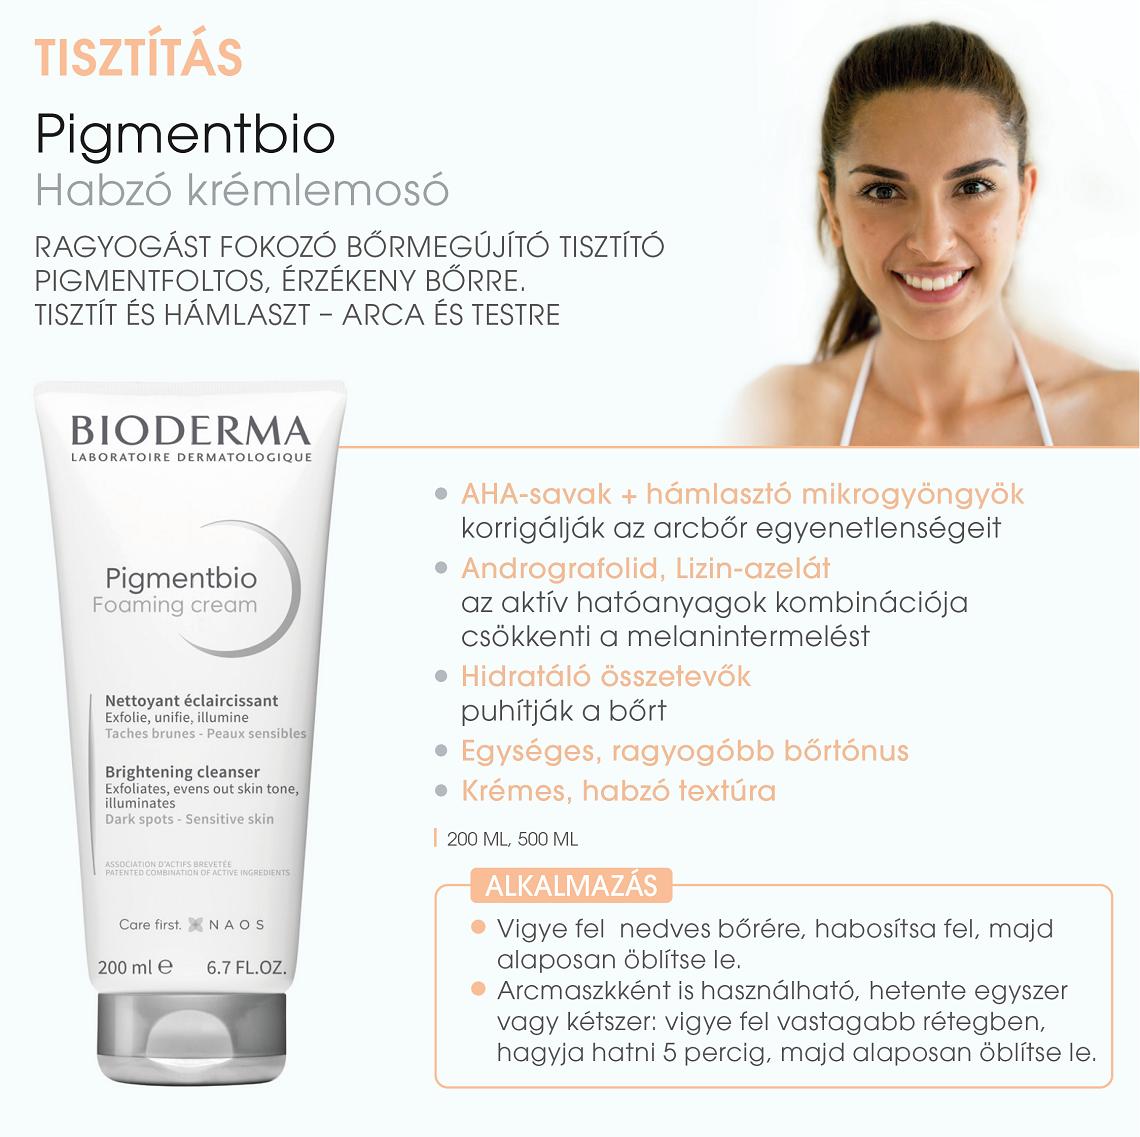 Bioderma Pigmentbio termékcsalád